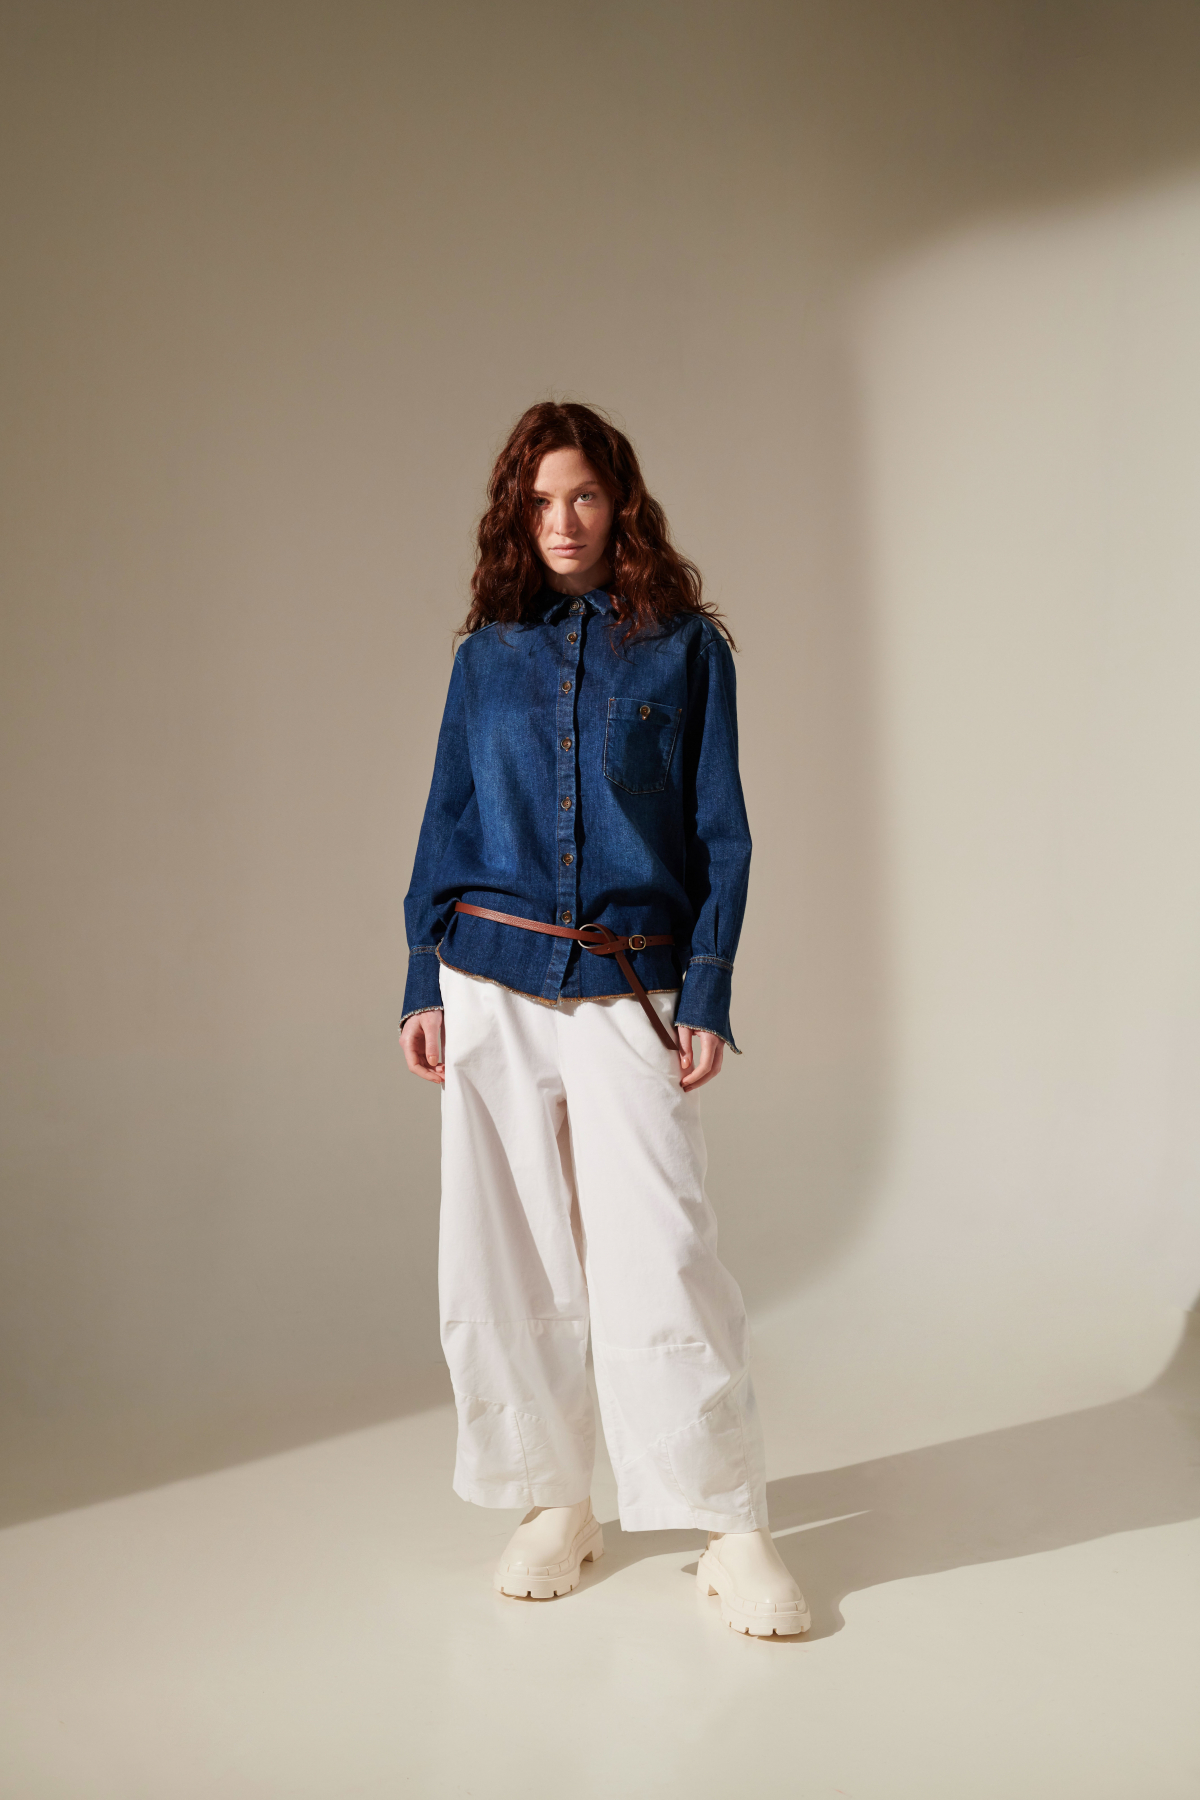 style ASPIC135LIN dress  style BURROTAF jacket